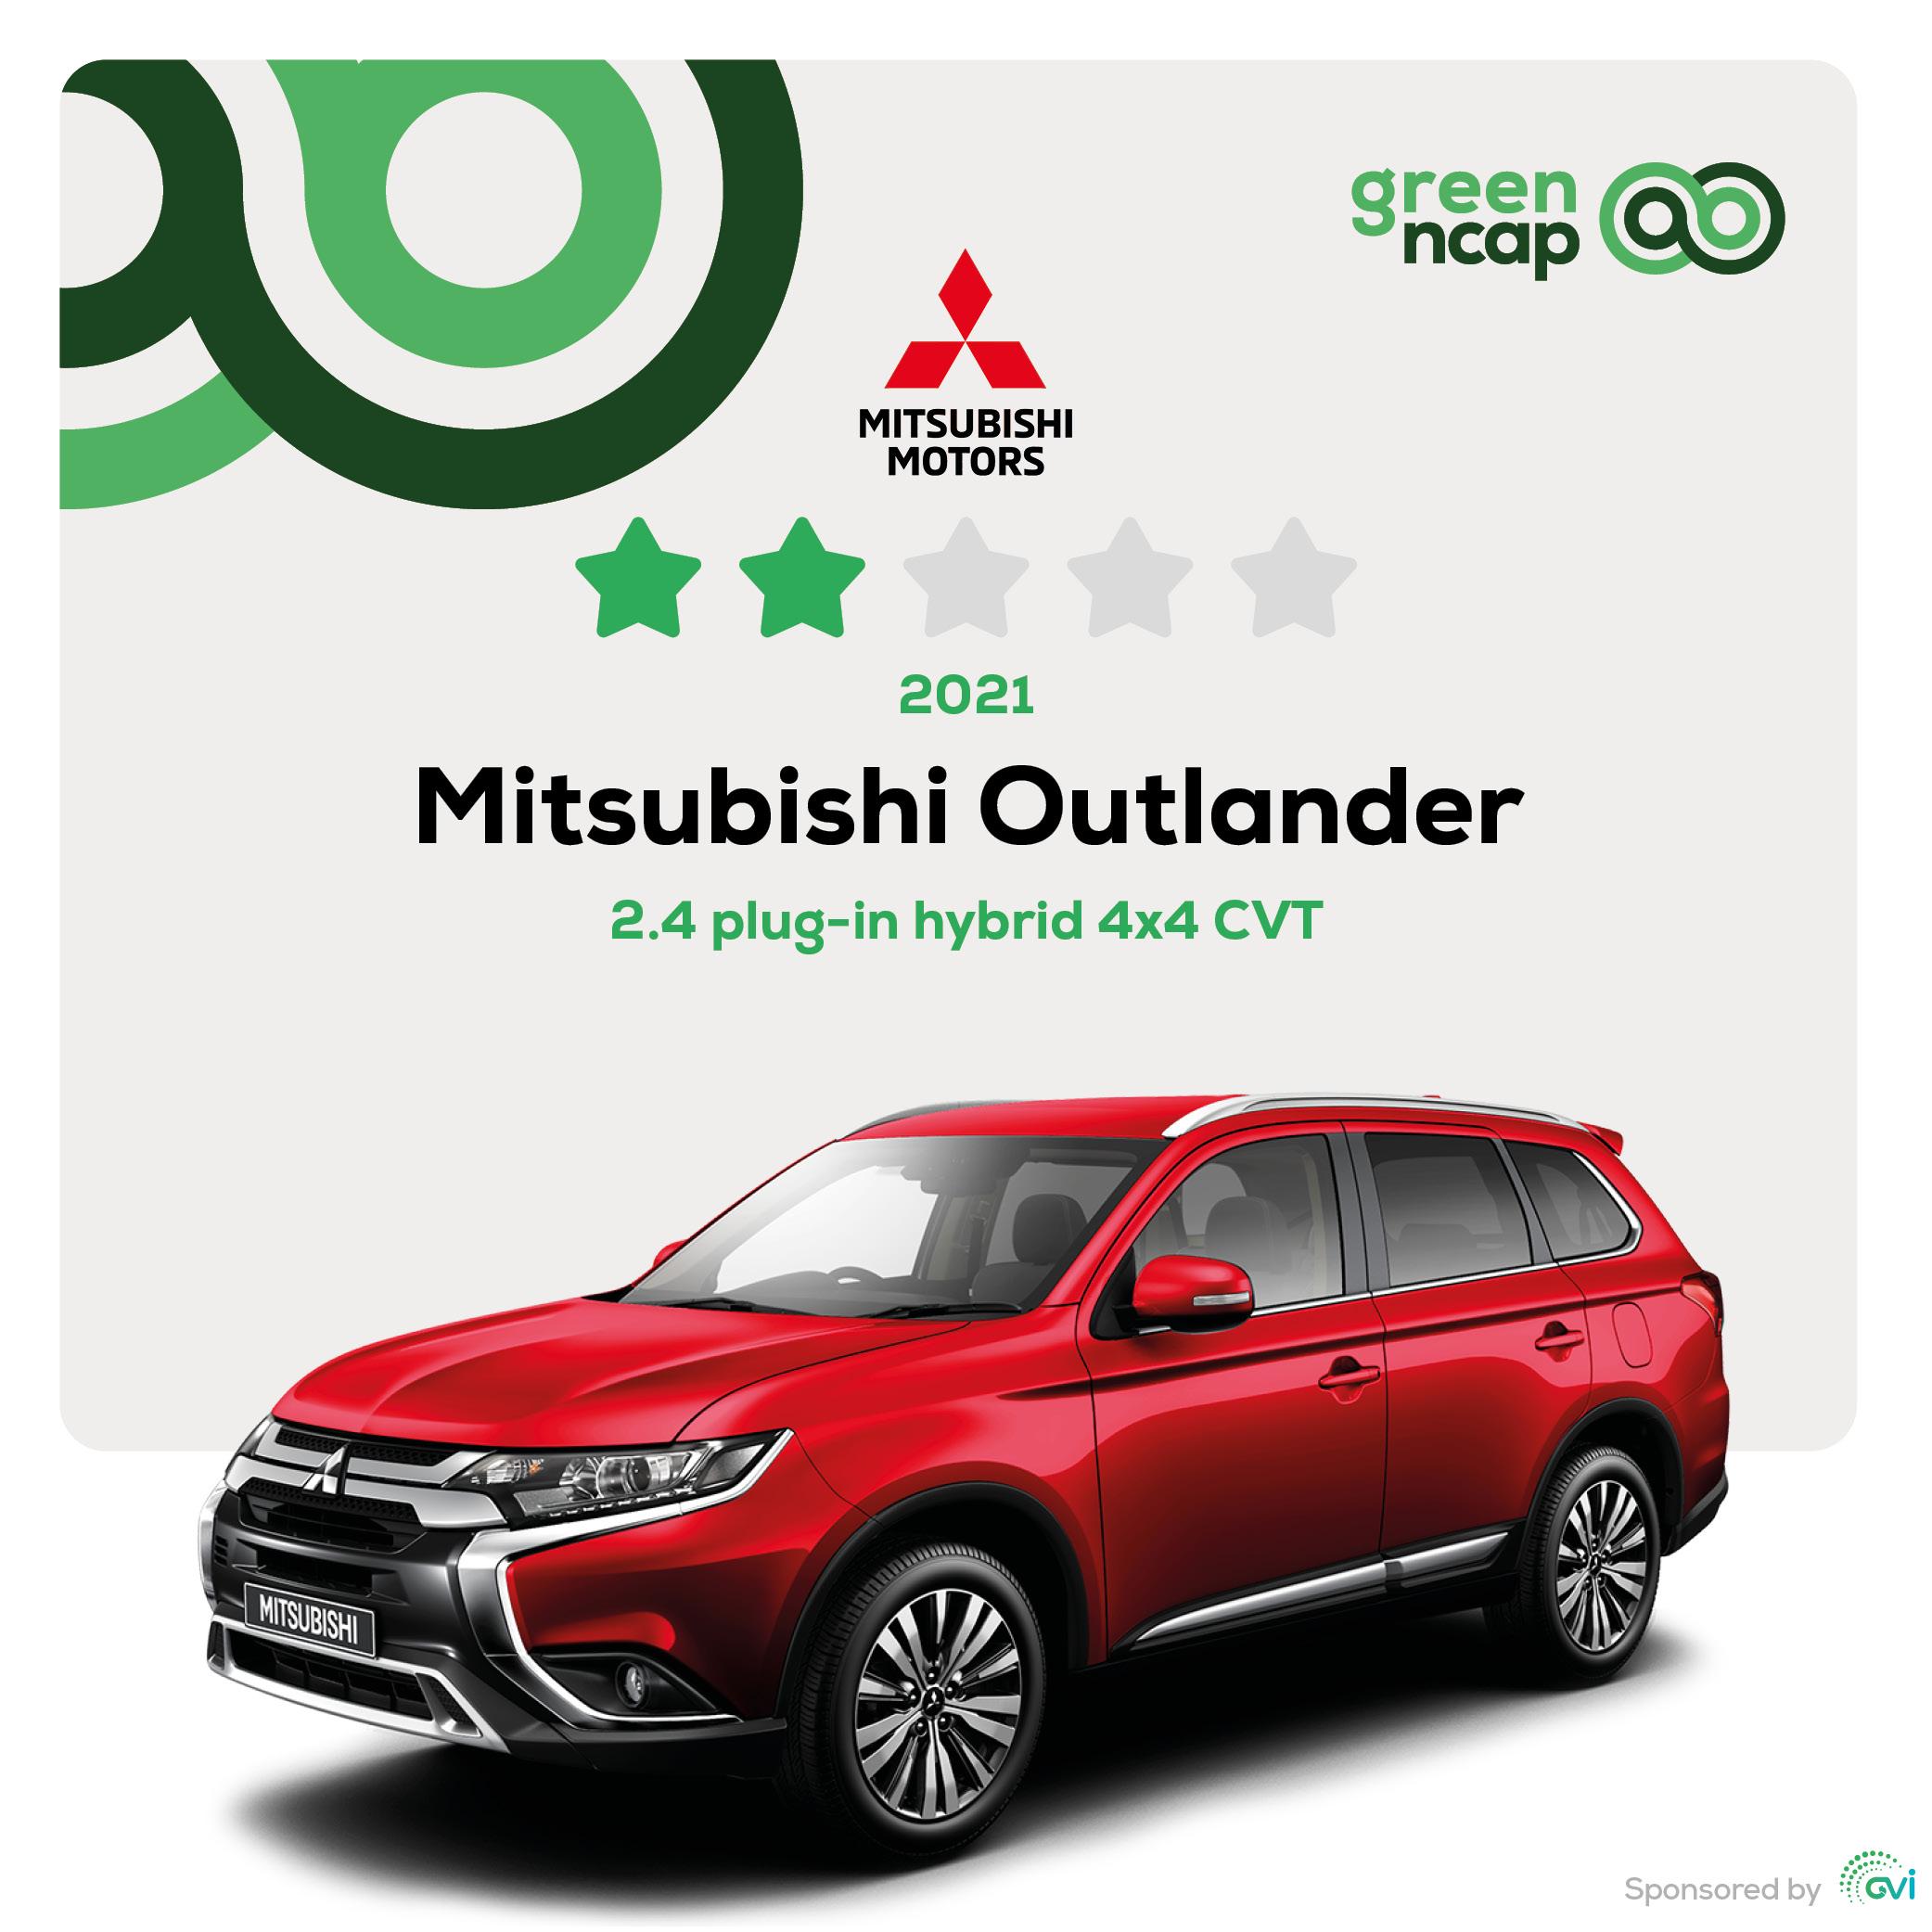 Mitsubishi Outlander - Green NCAP Results February 2021 - 2 stars